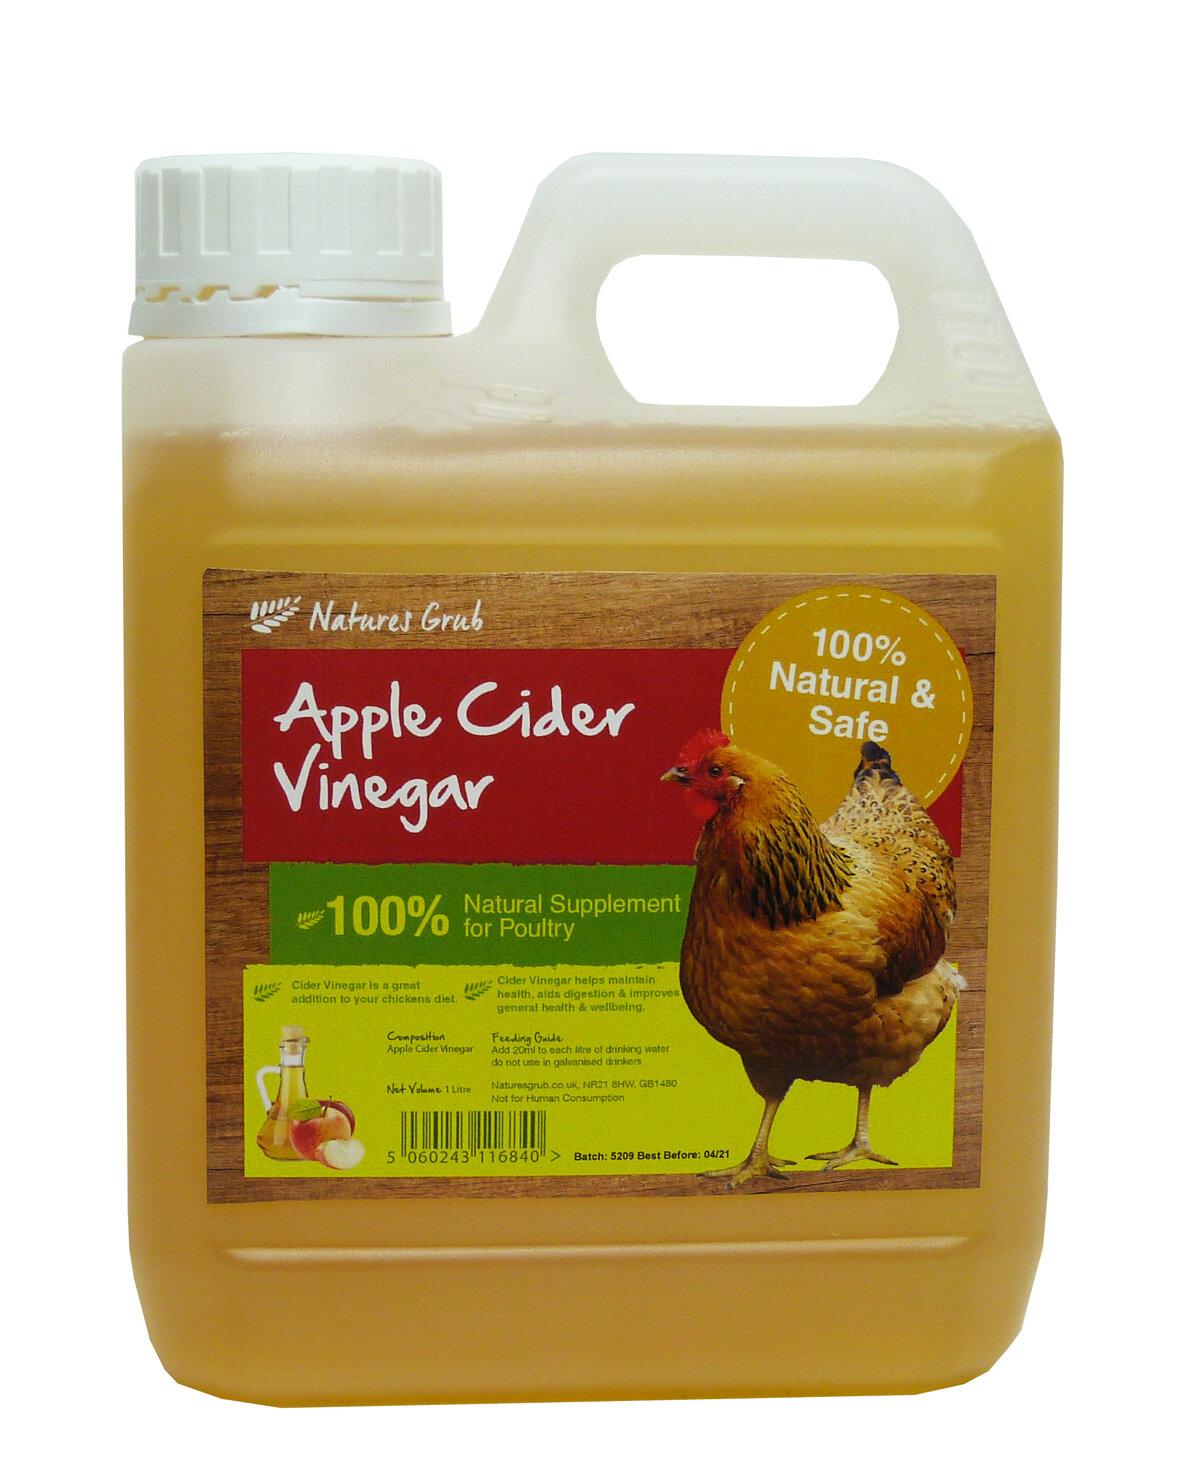 Natures Grub Organic Cider Vinegar 1 Litre x 1 [Zero VAT]